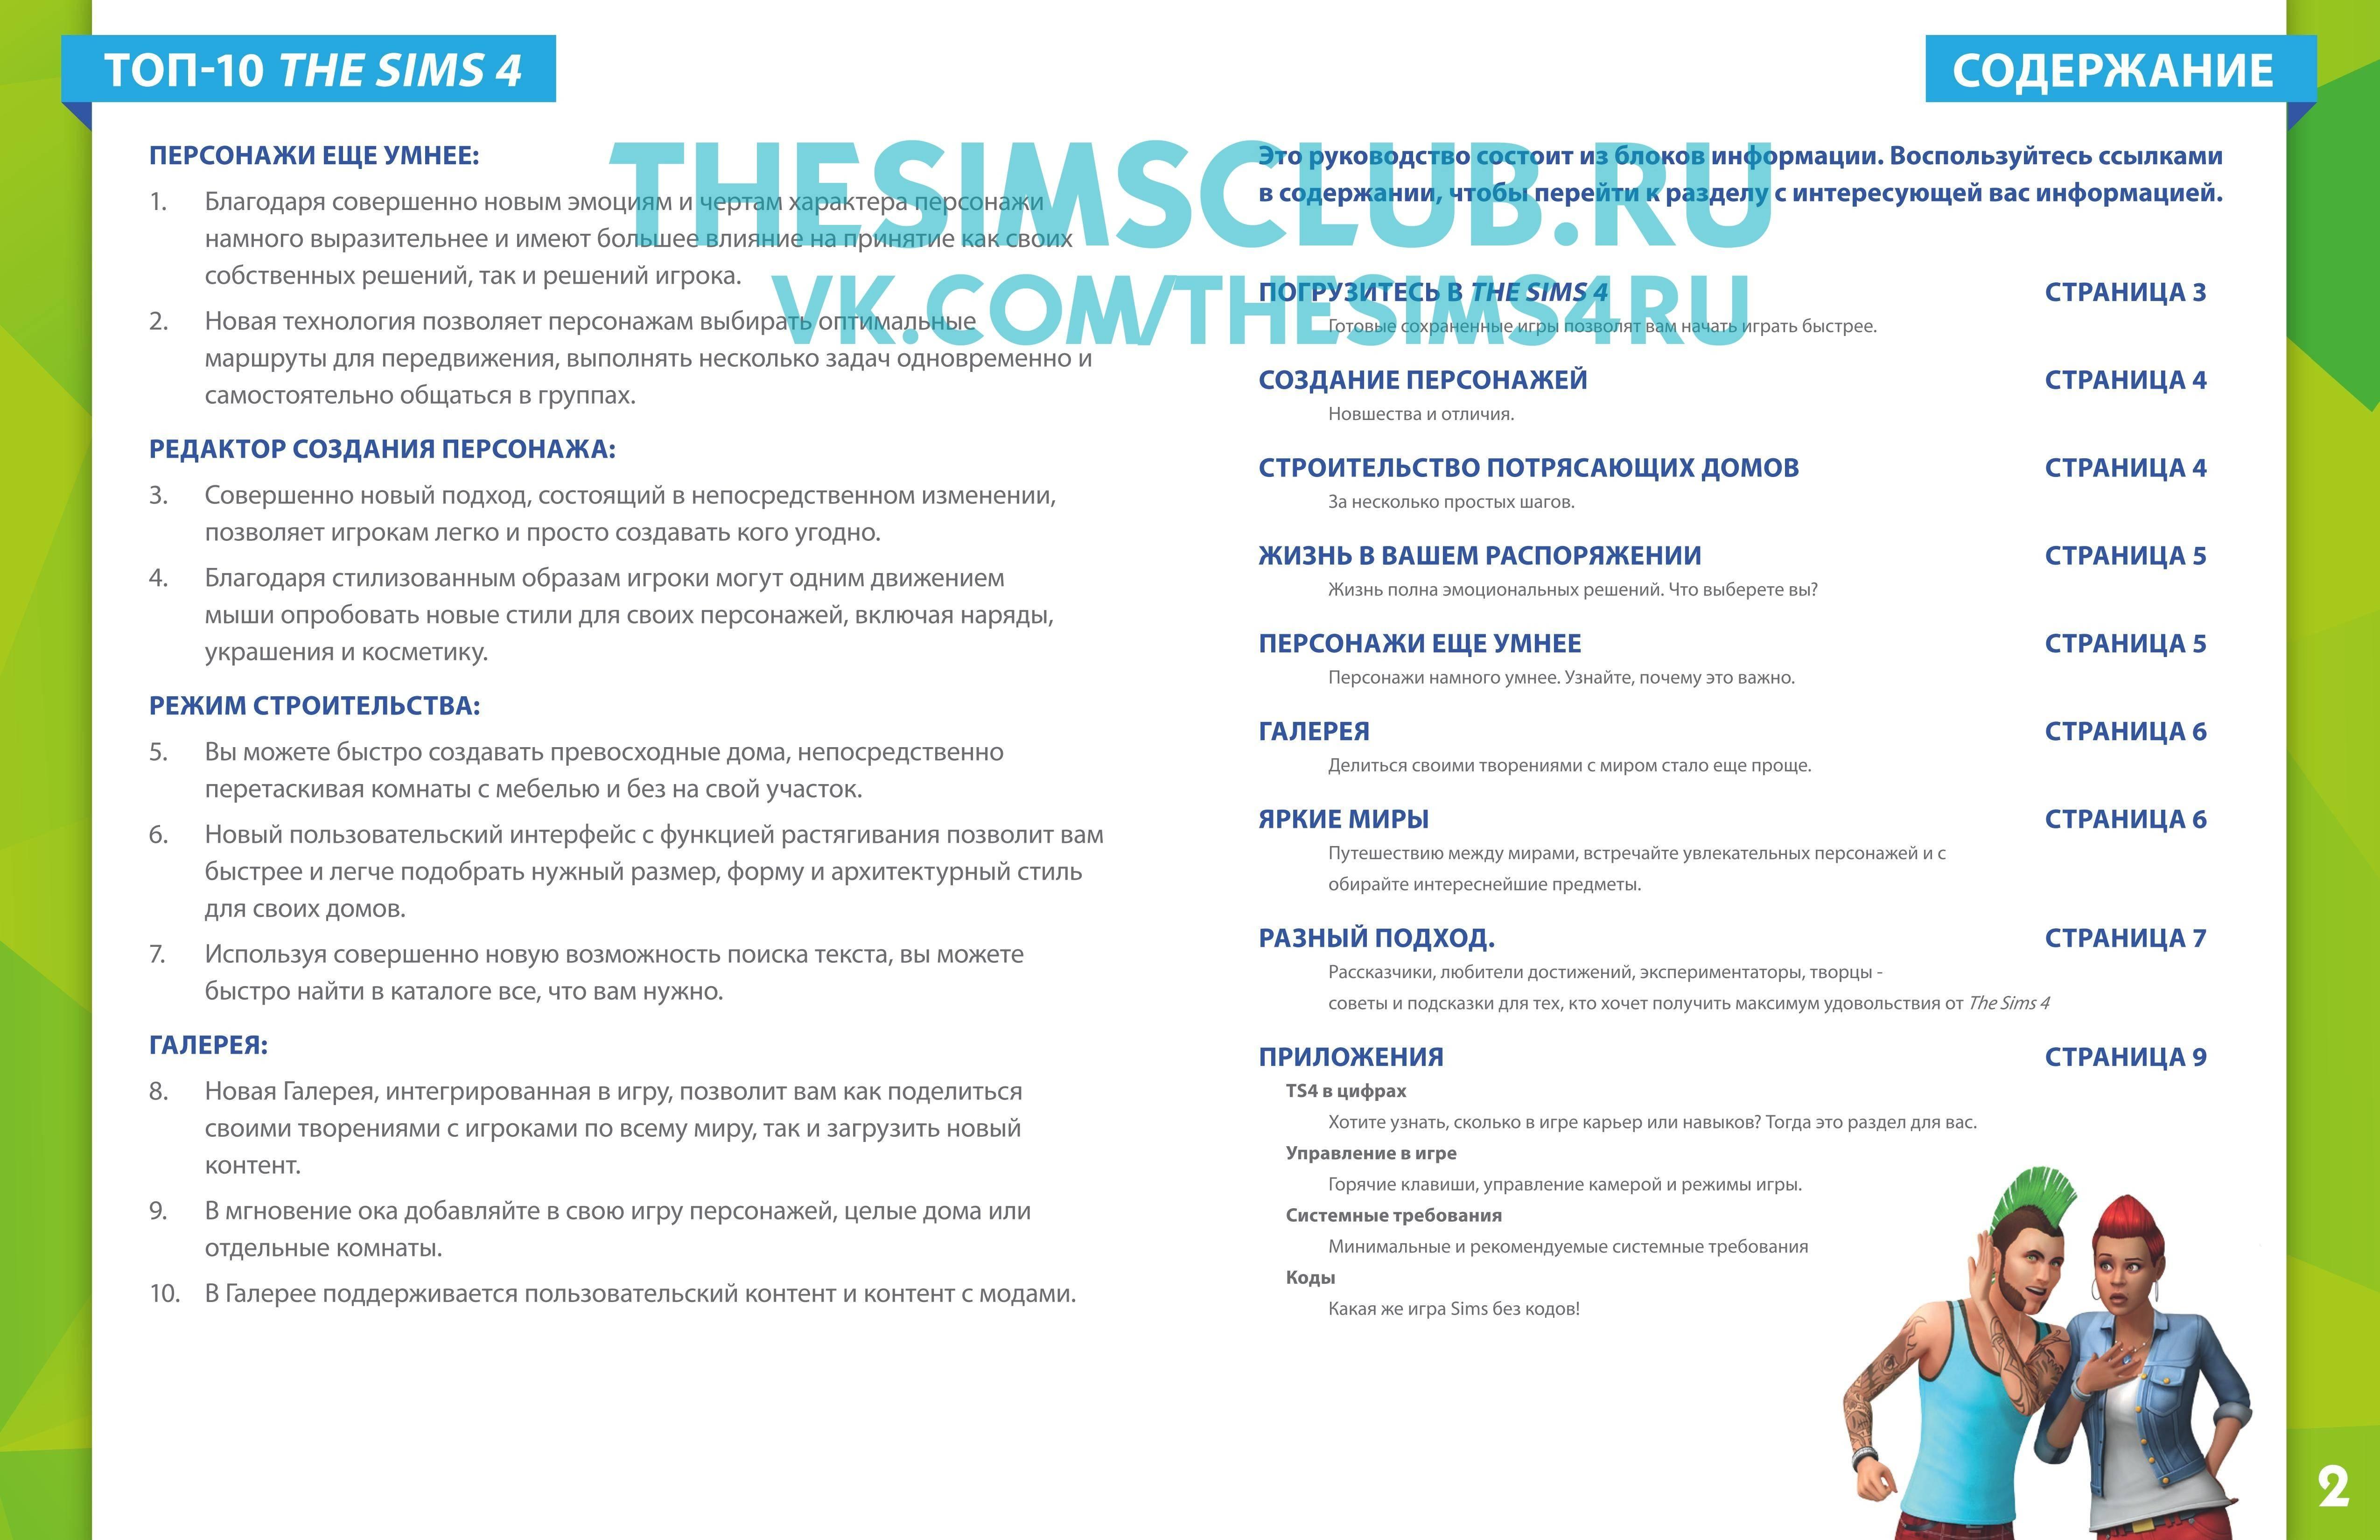 The Sims 4 Коды #1 - YouTube